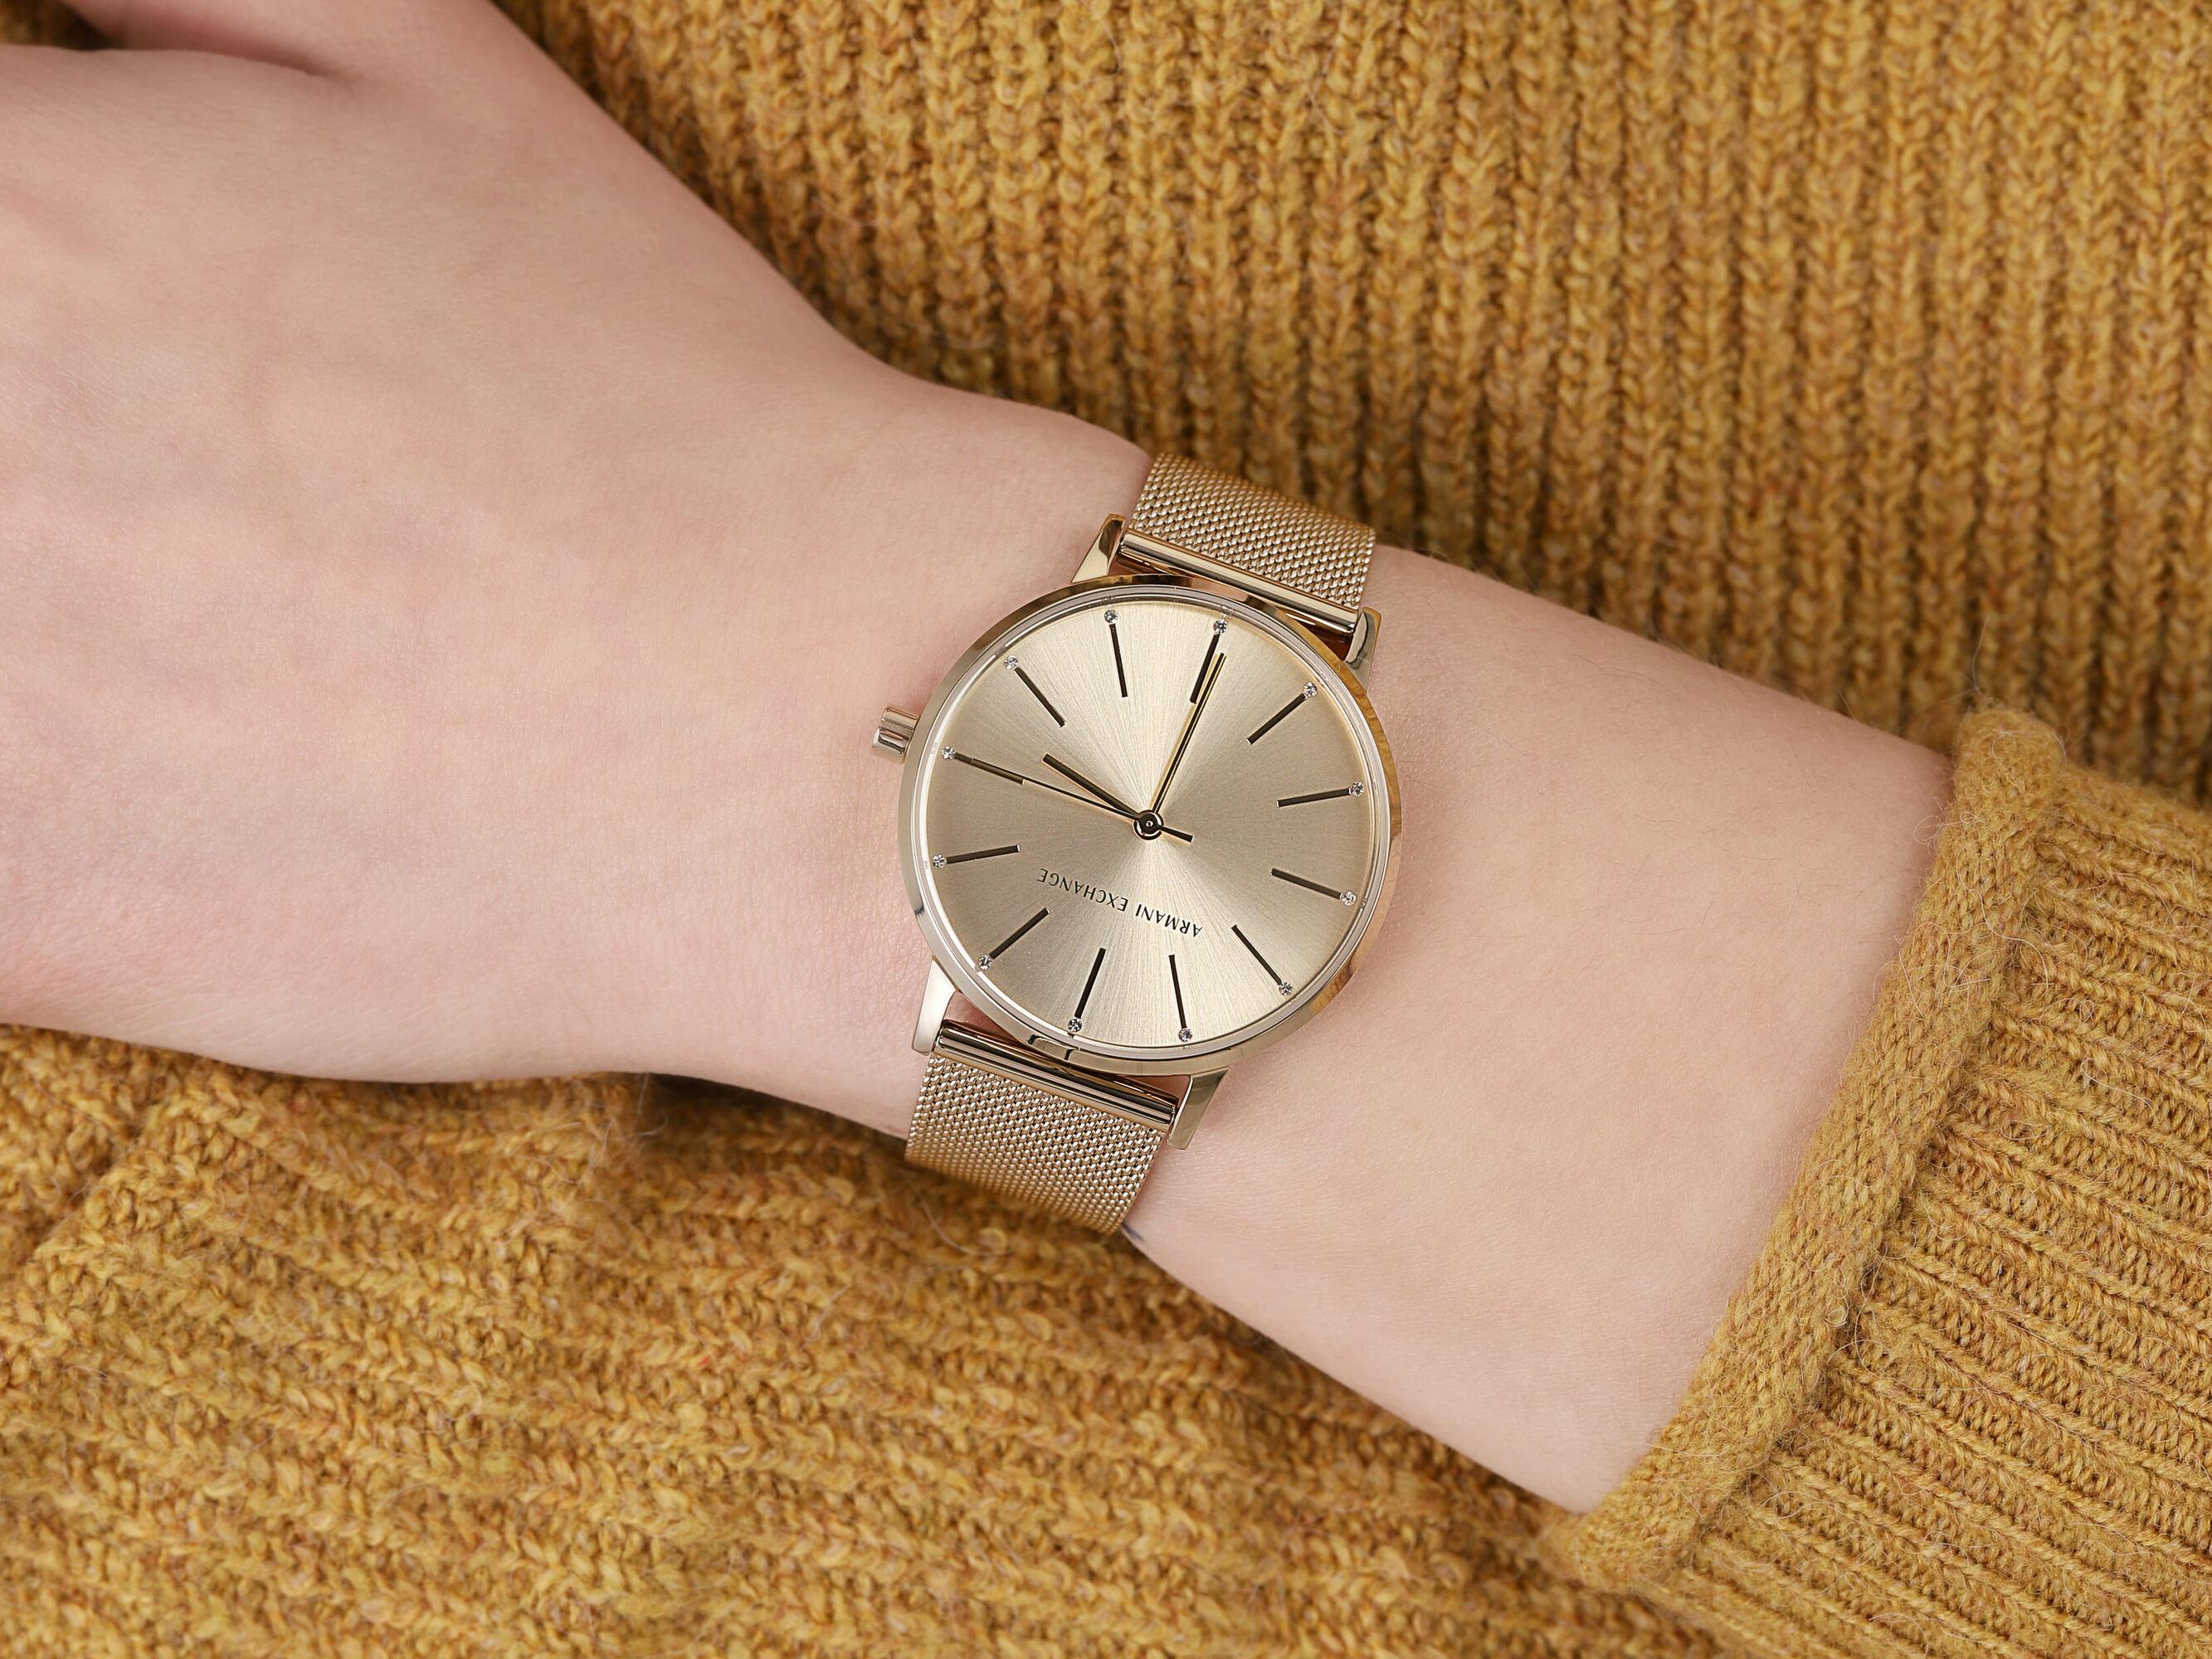 Armani Exchange AX5536 damski zegarek Fashion bransoleta